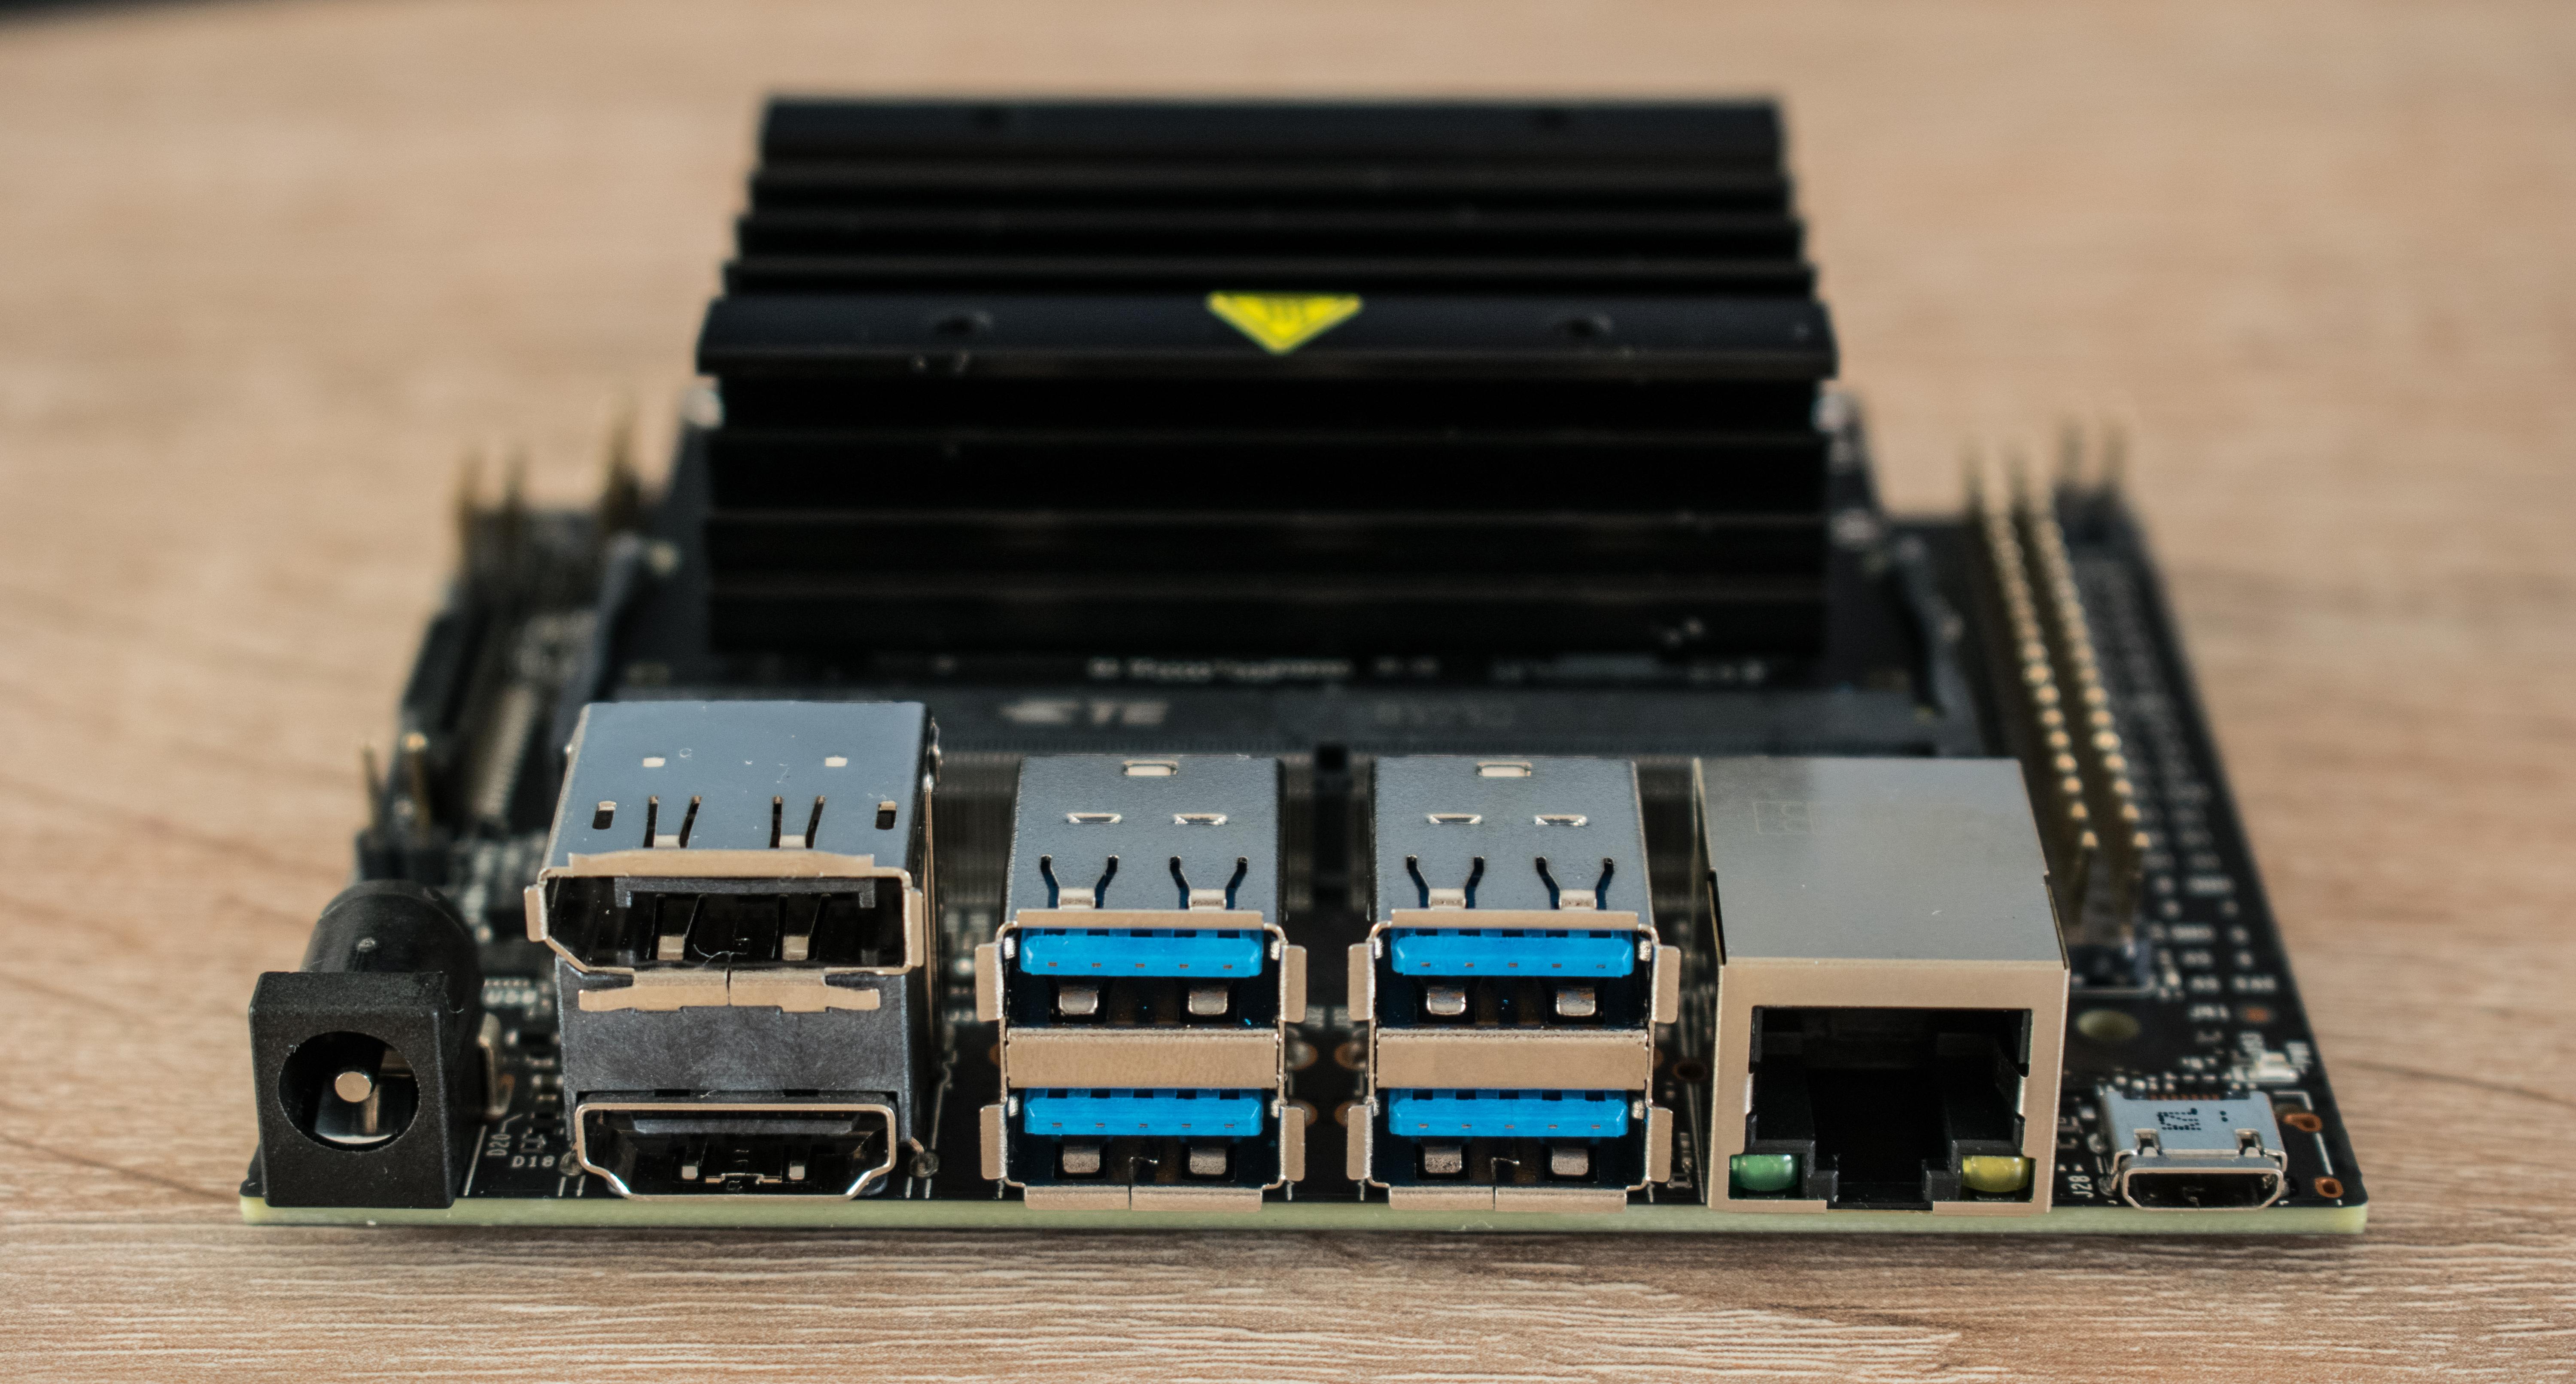 Nvidia Announces Jetson Nano Dev Kit & Board: X1 for $99